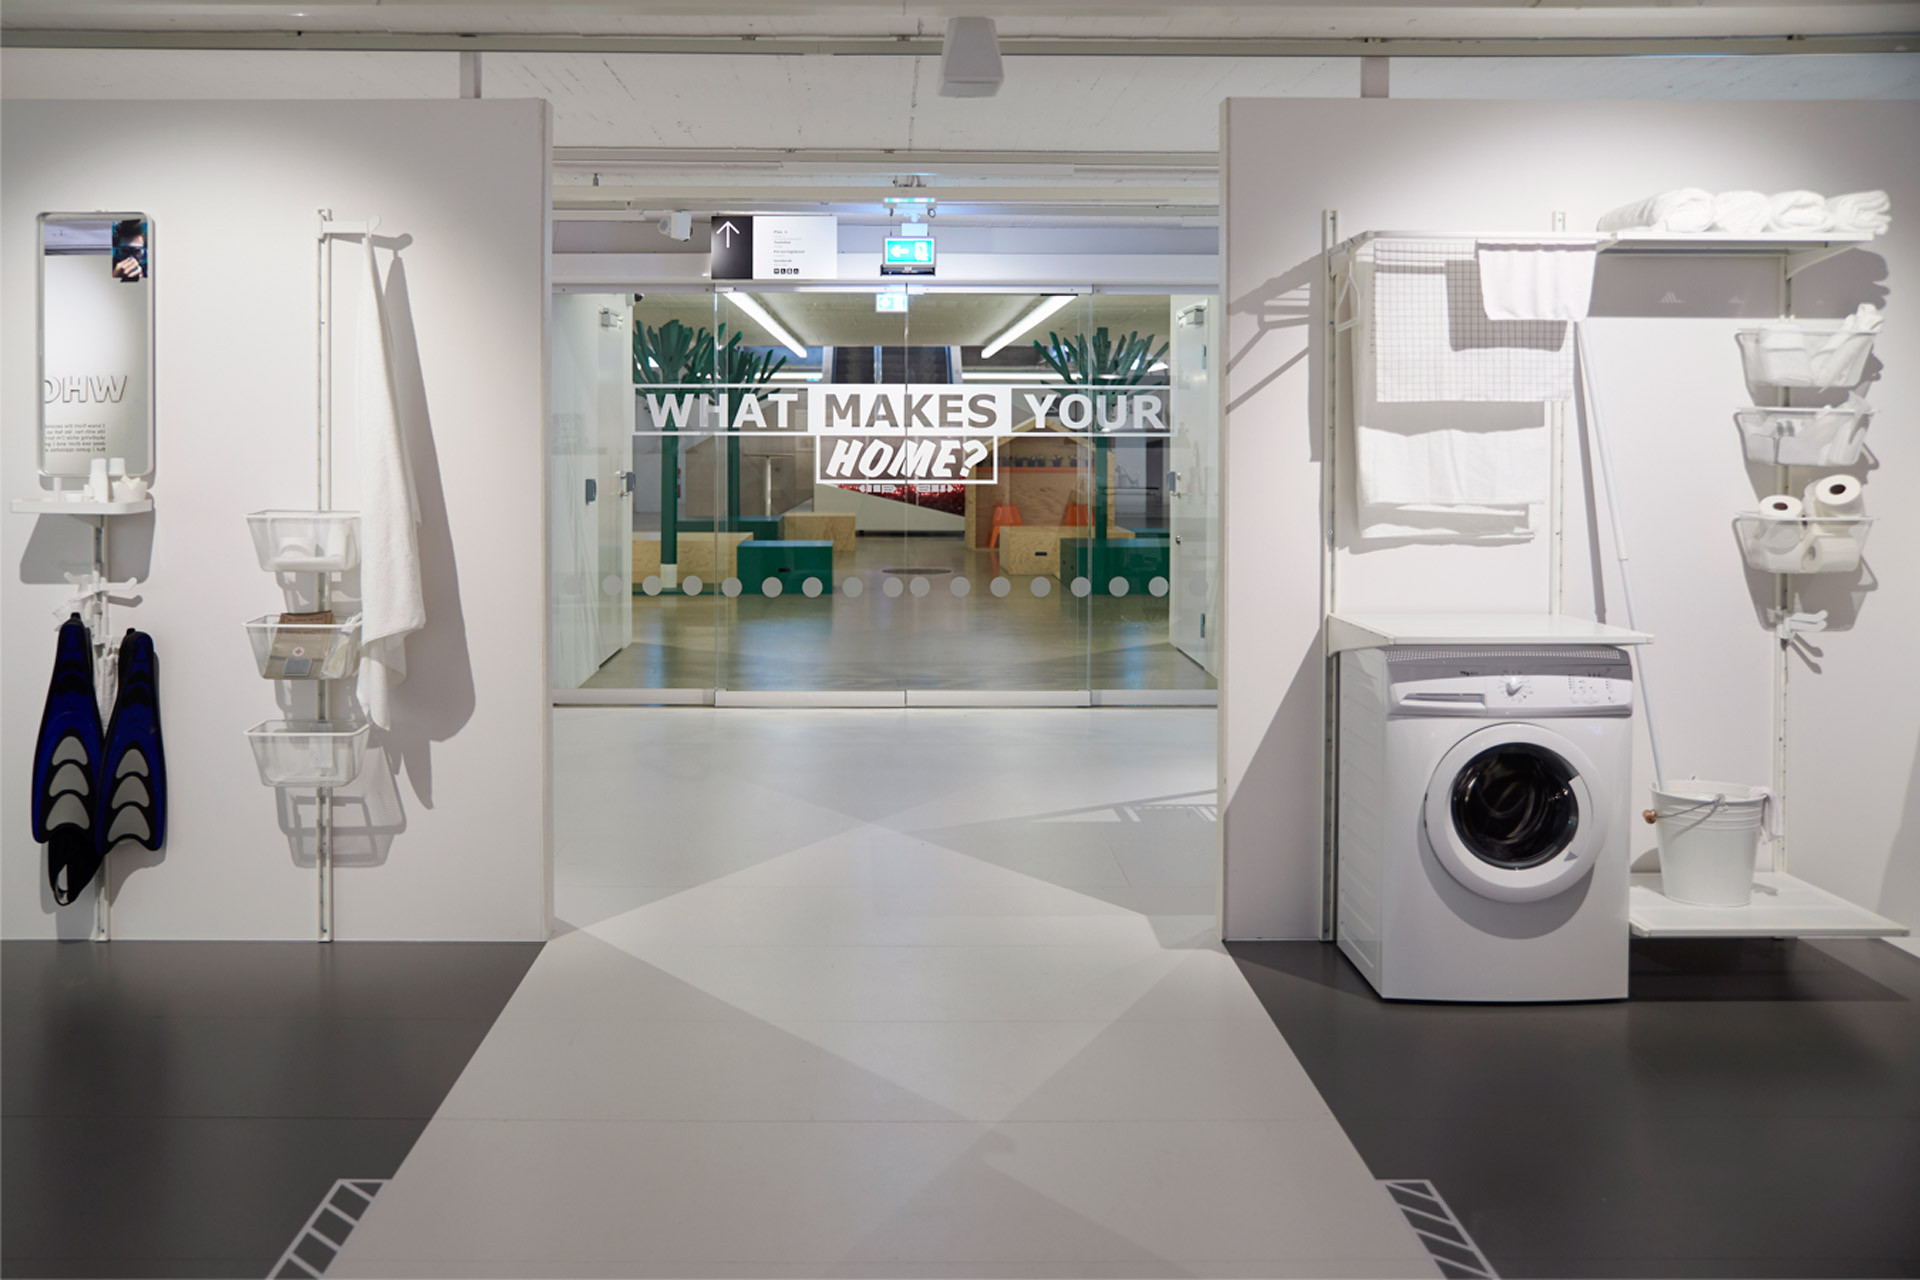 Hans Pelle Jart Ikea exhibition